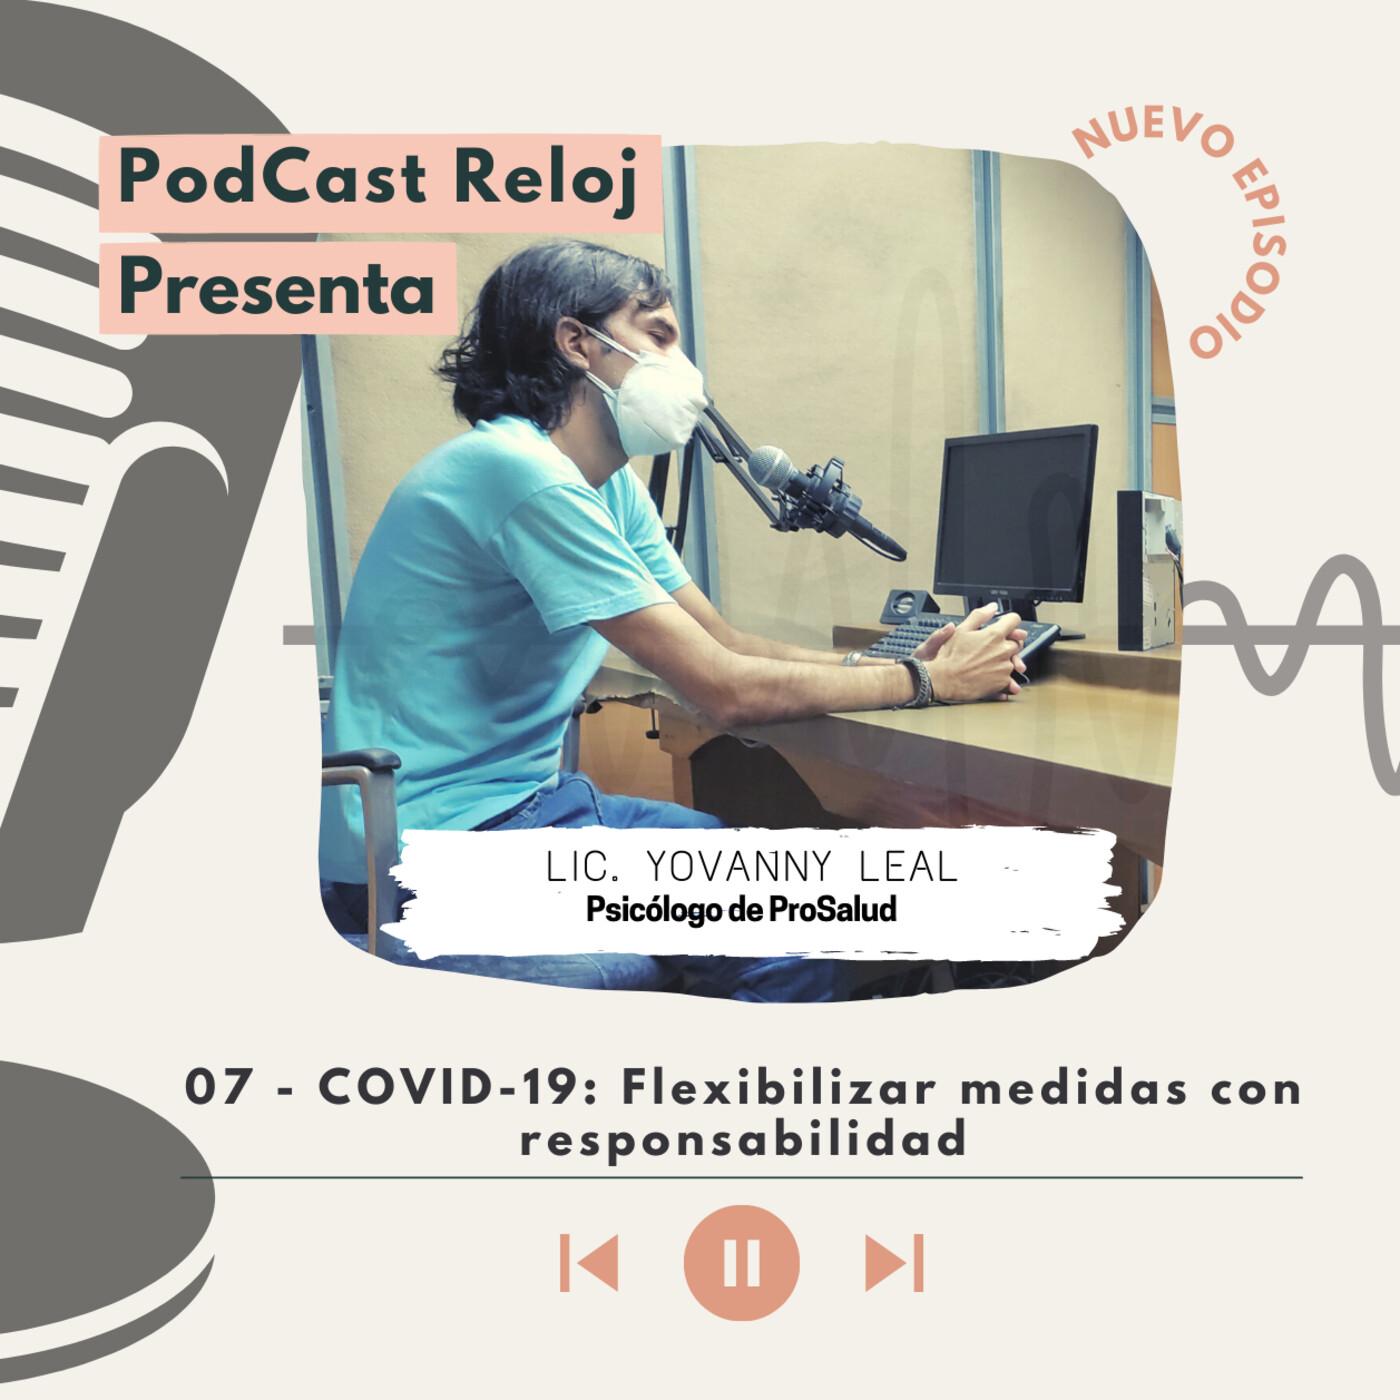 Covid-19: Flexibilizar medidas con responsabilidad.